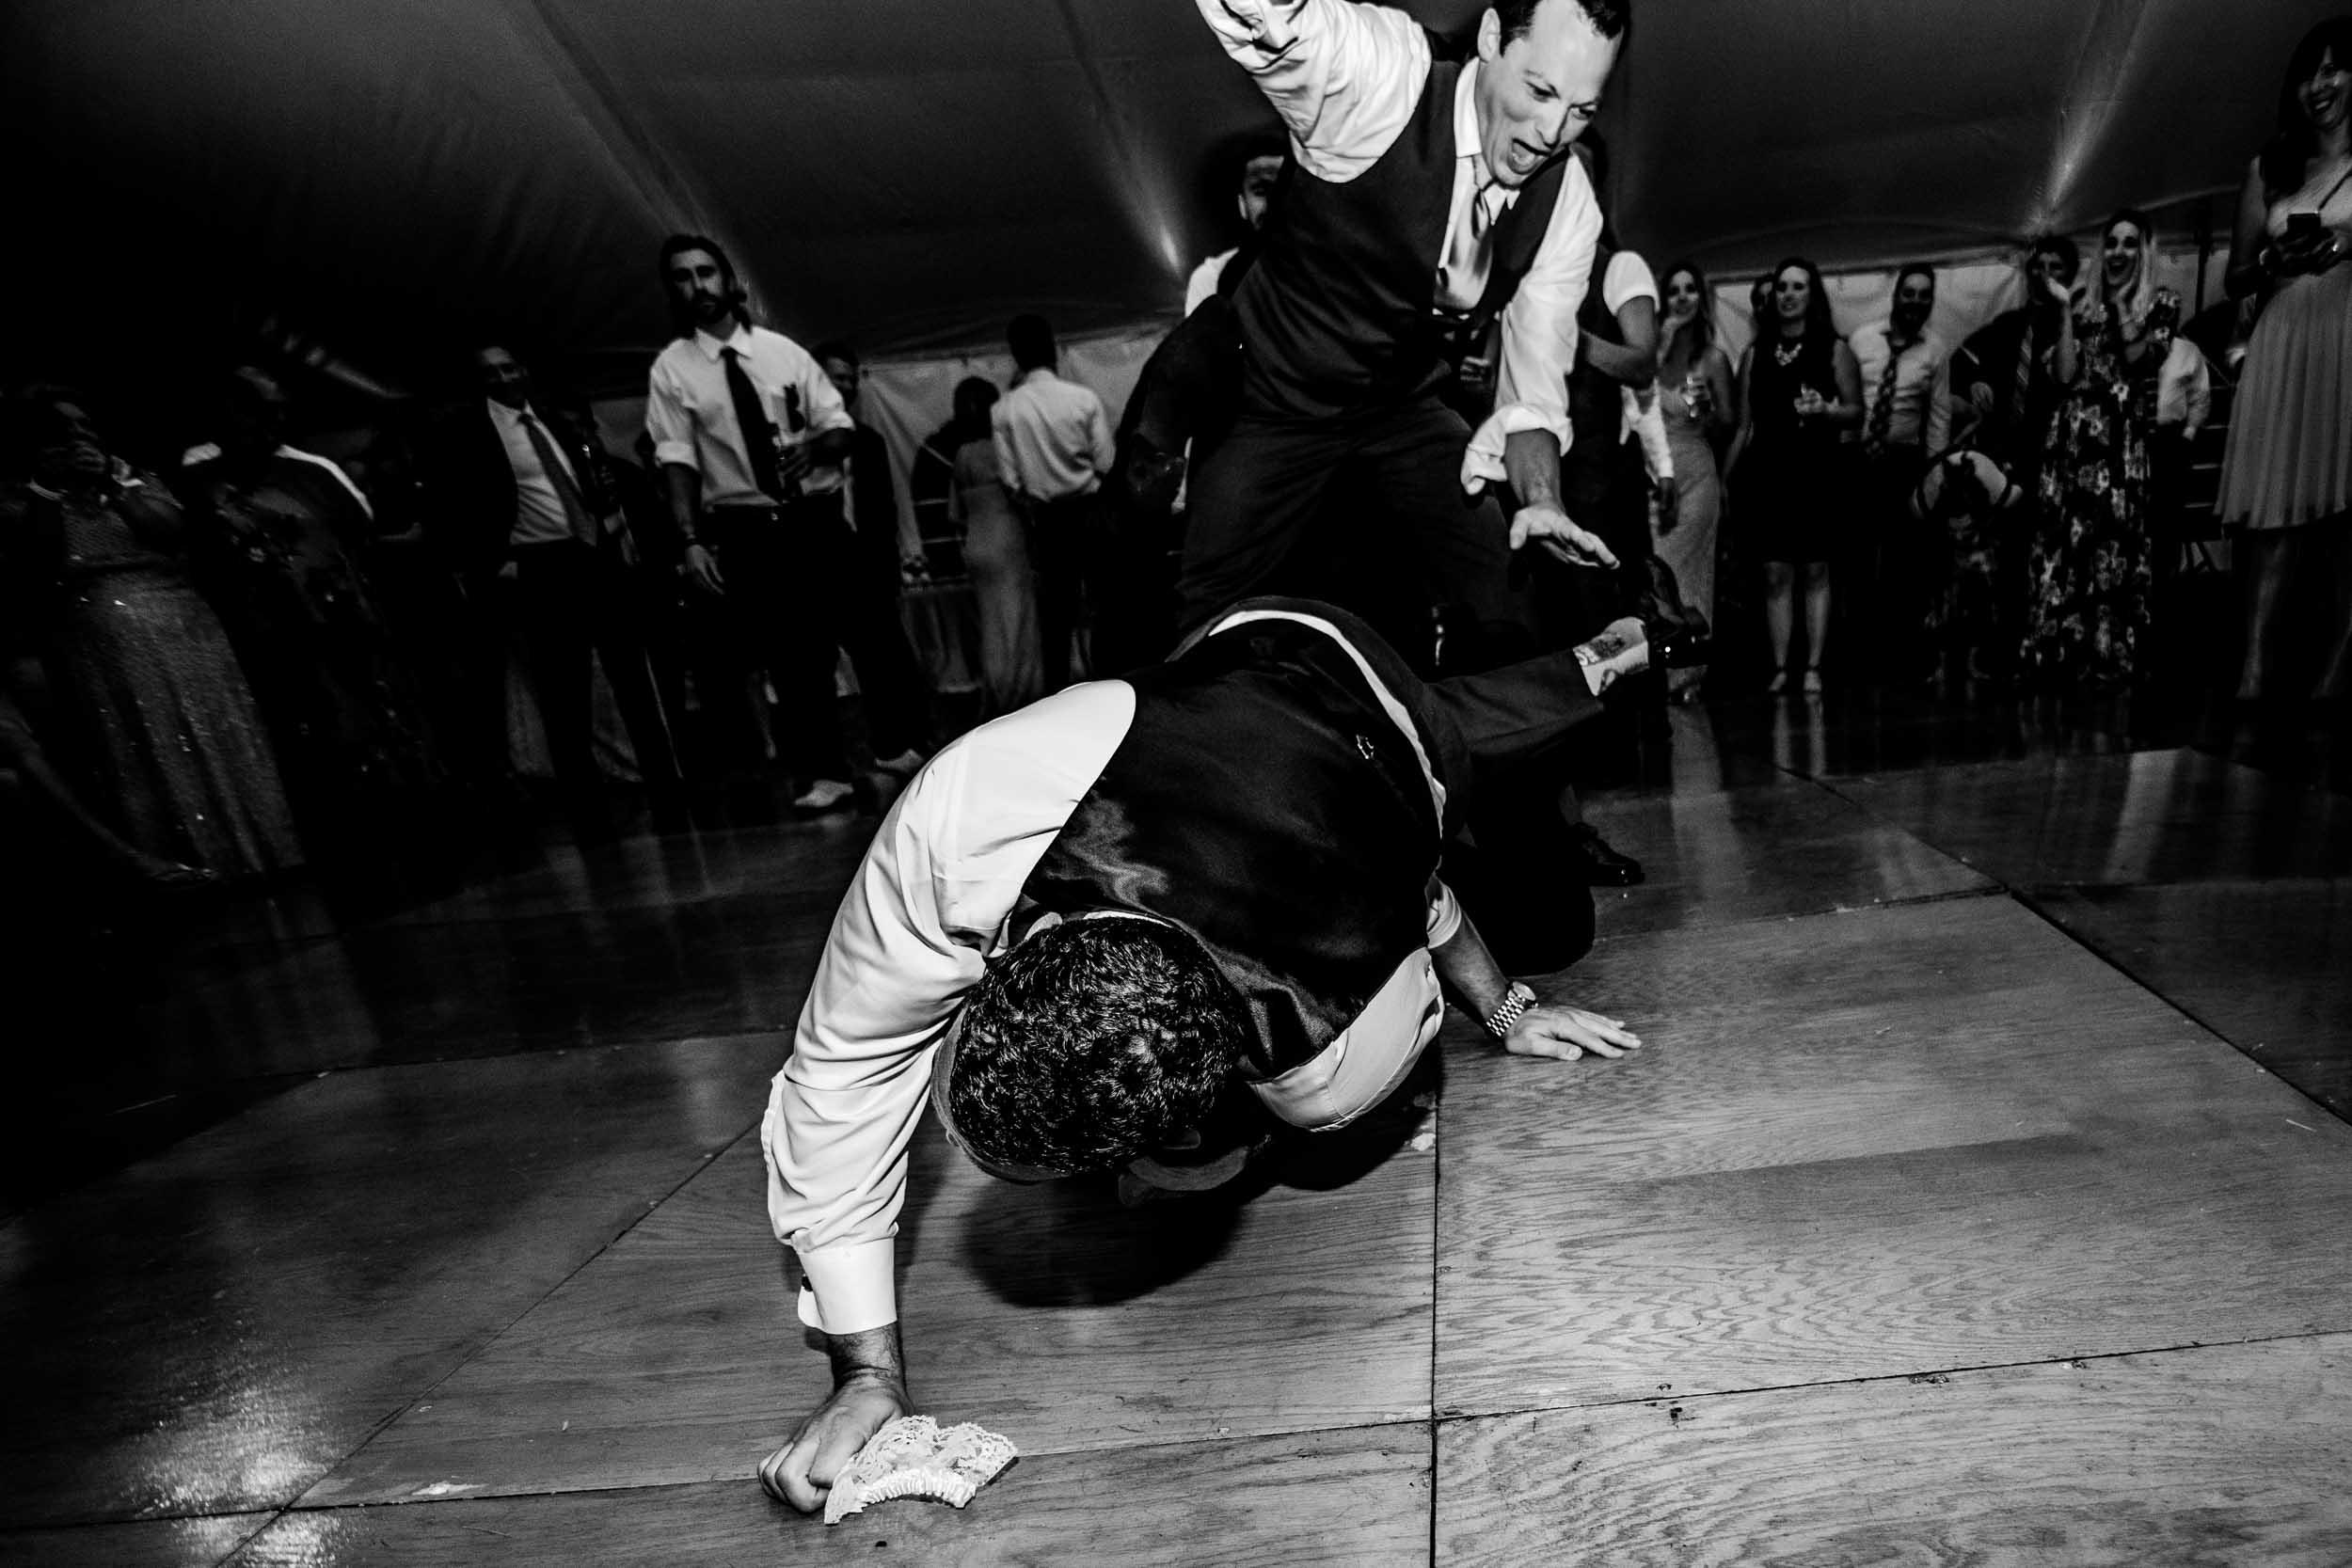 dc+metro+wedding+photographer+vadym+guliuk+photography+wedding+garter+toss-2026.jpg